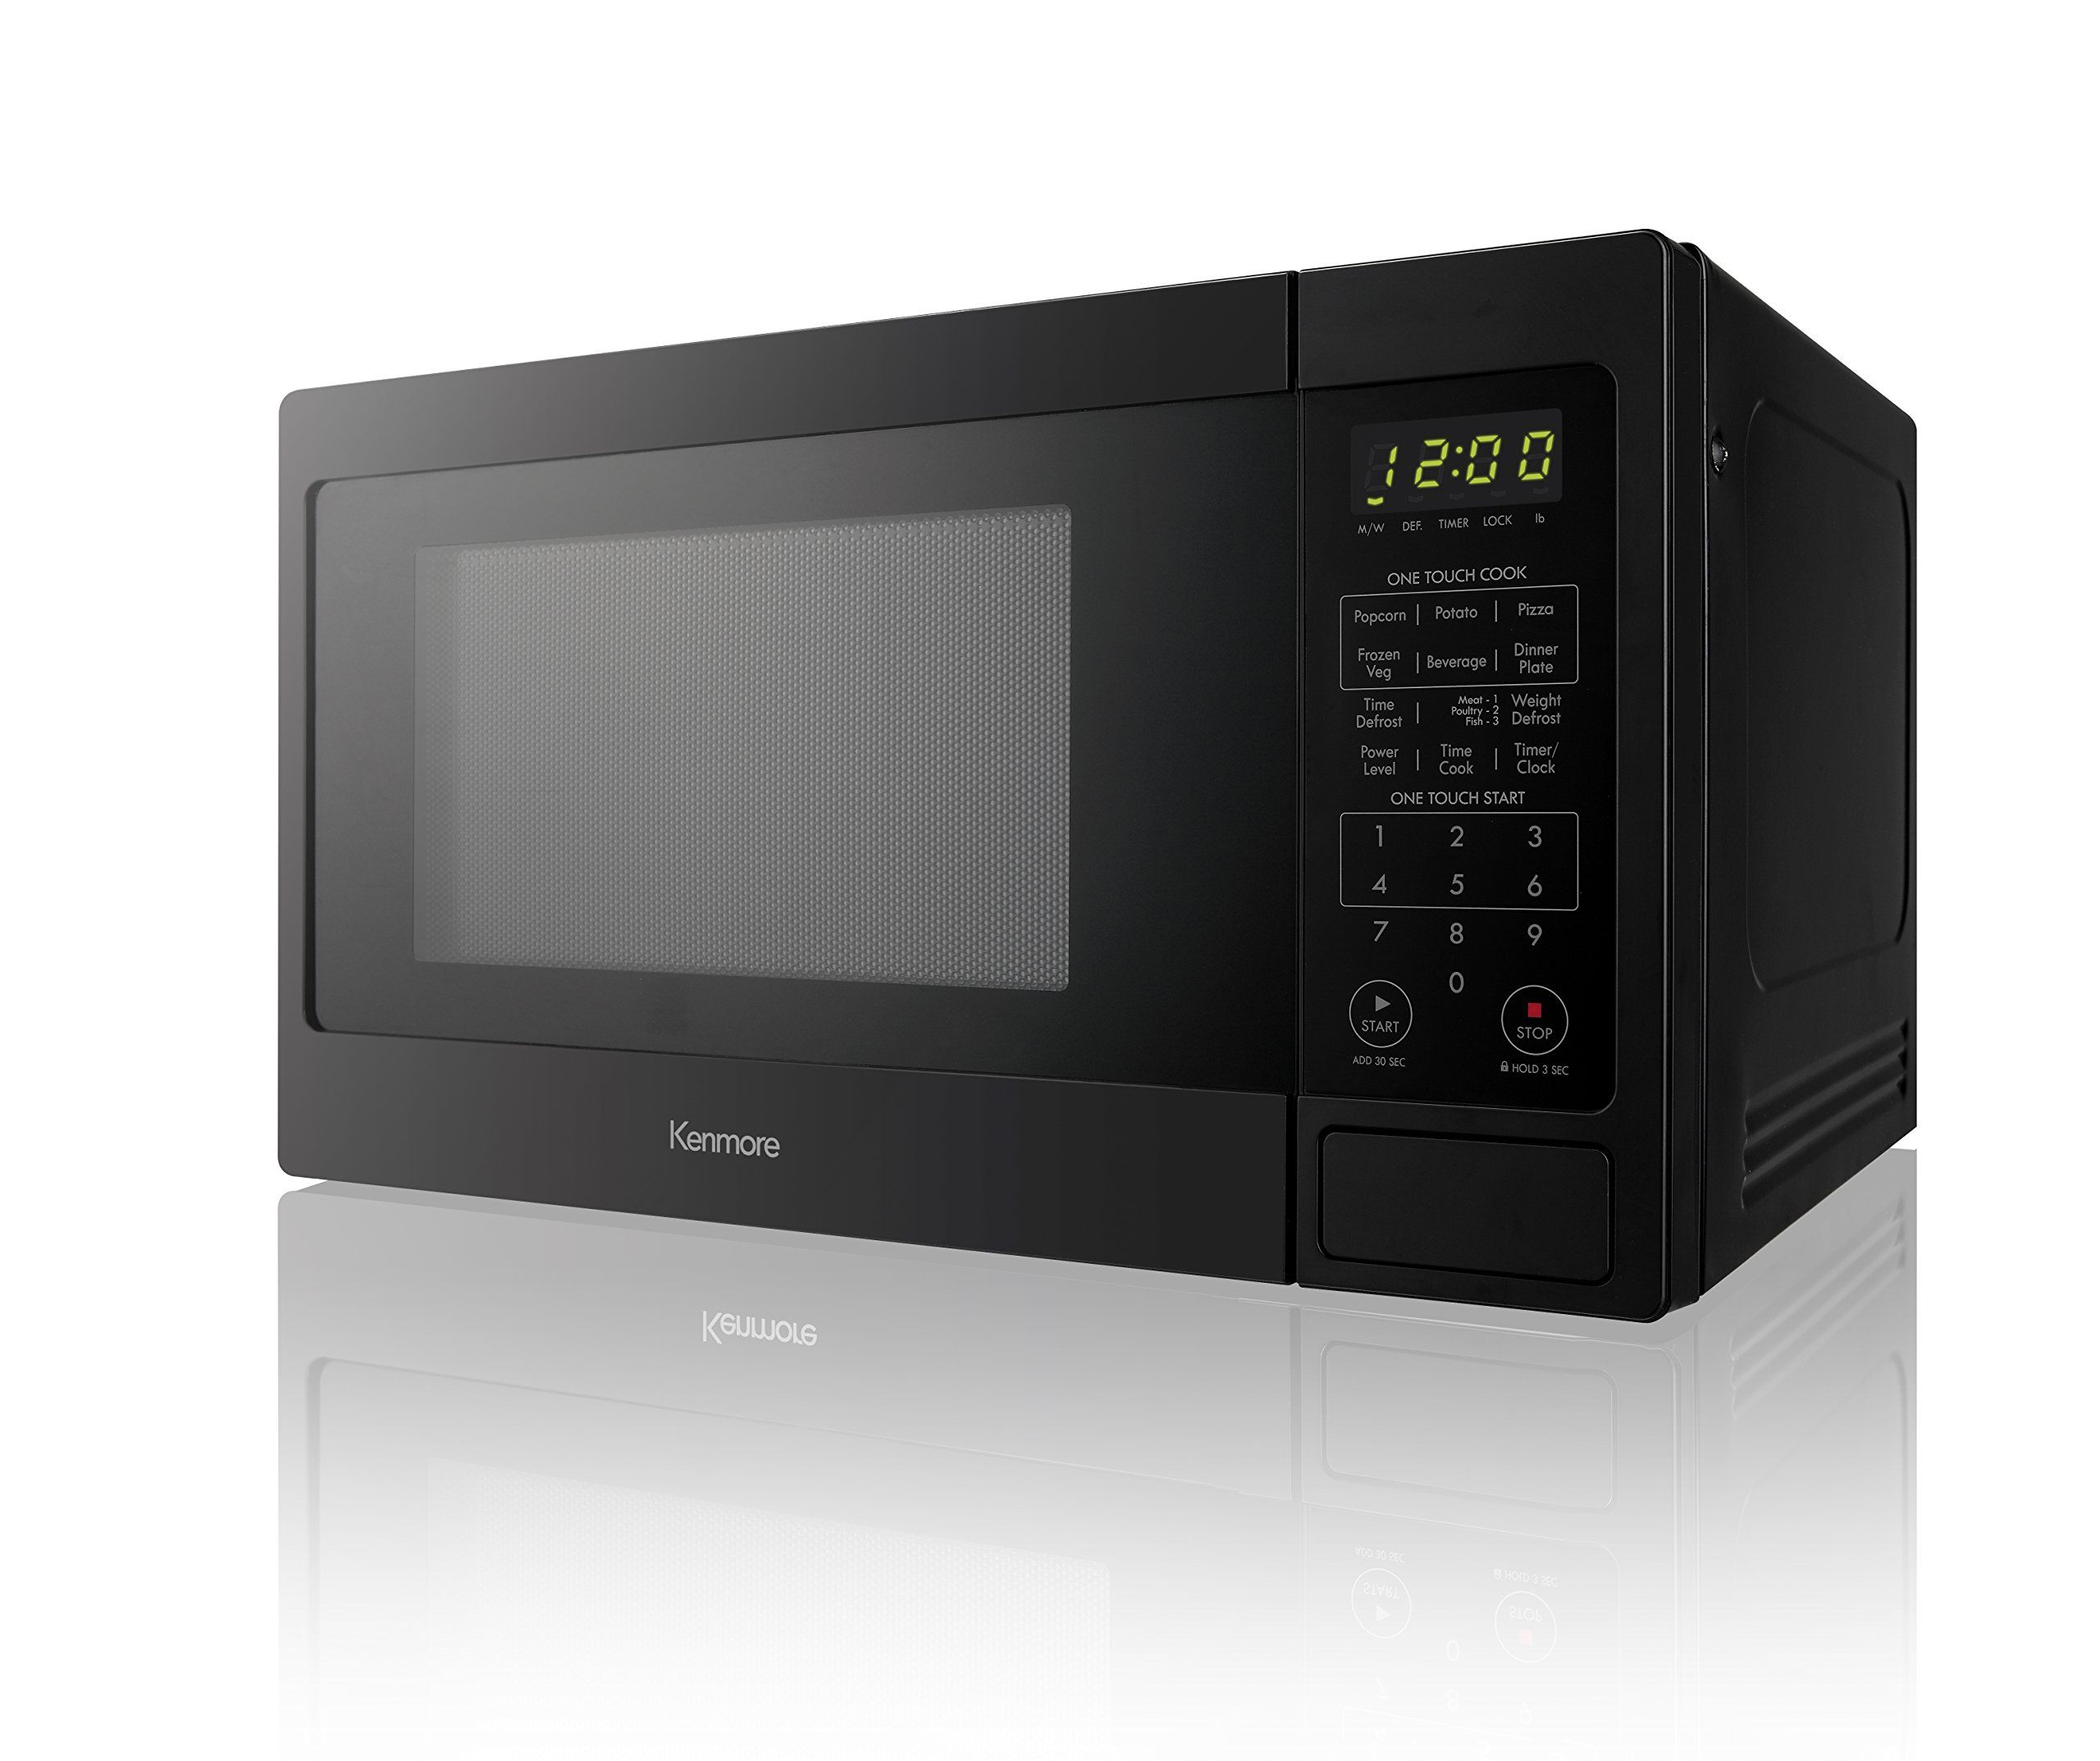 kenmore 70919 countertop microwave 0 9